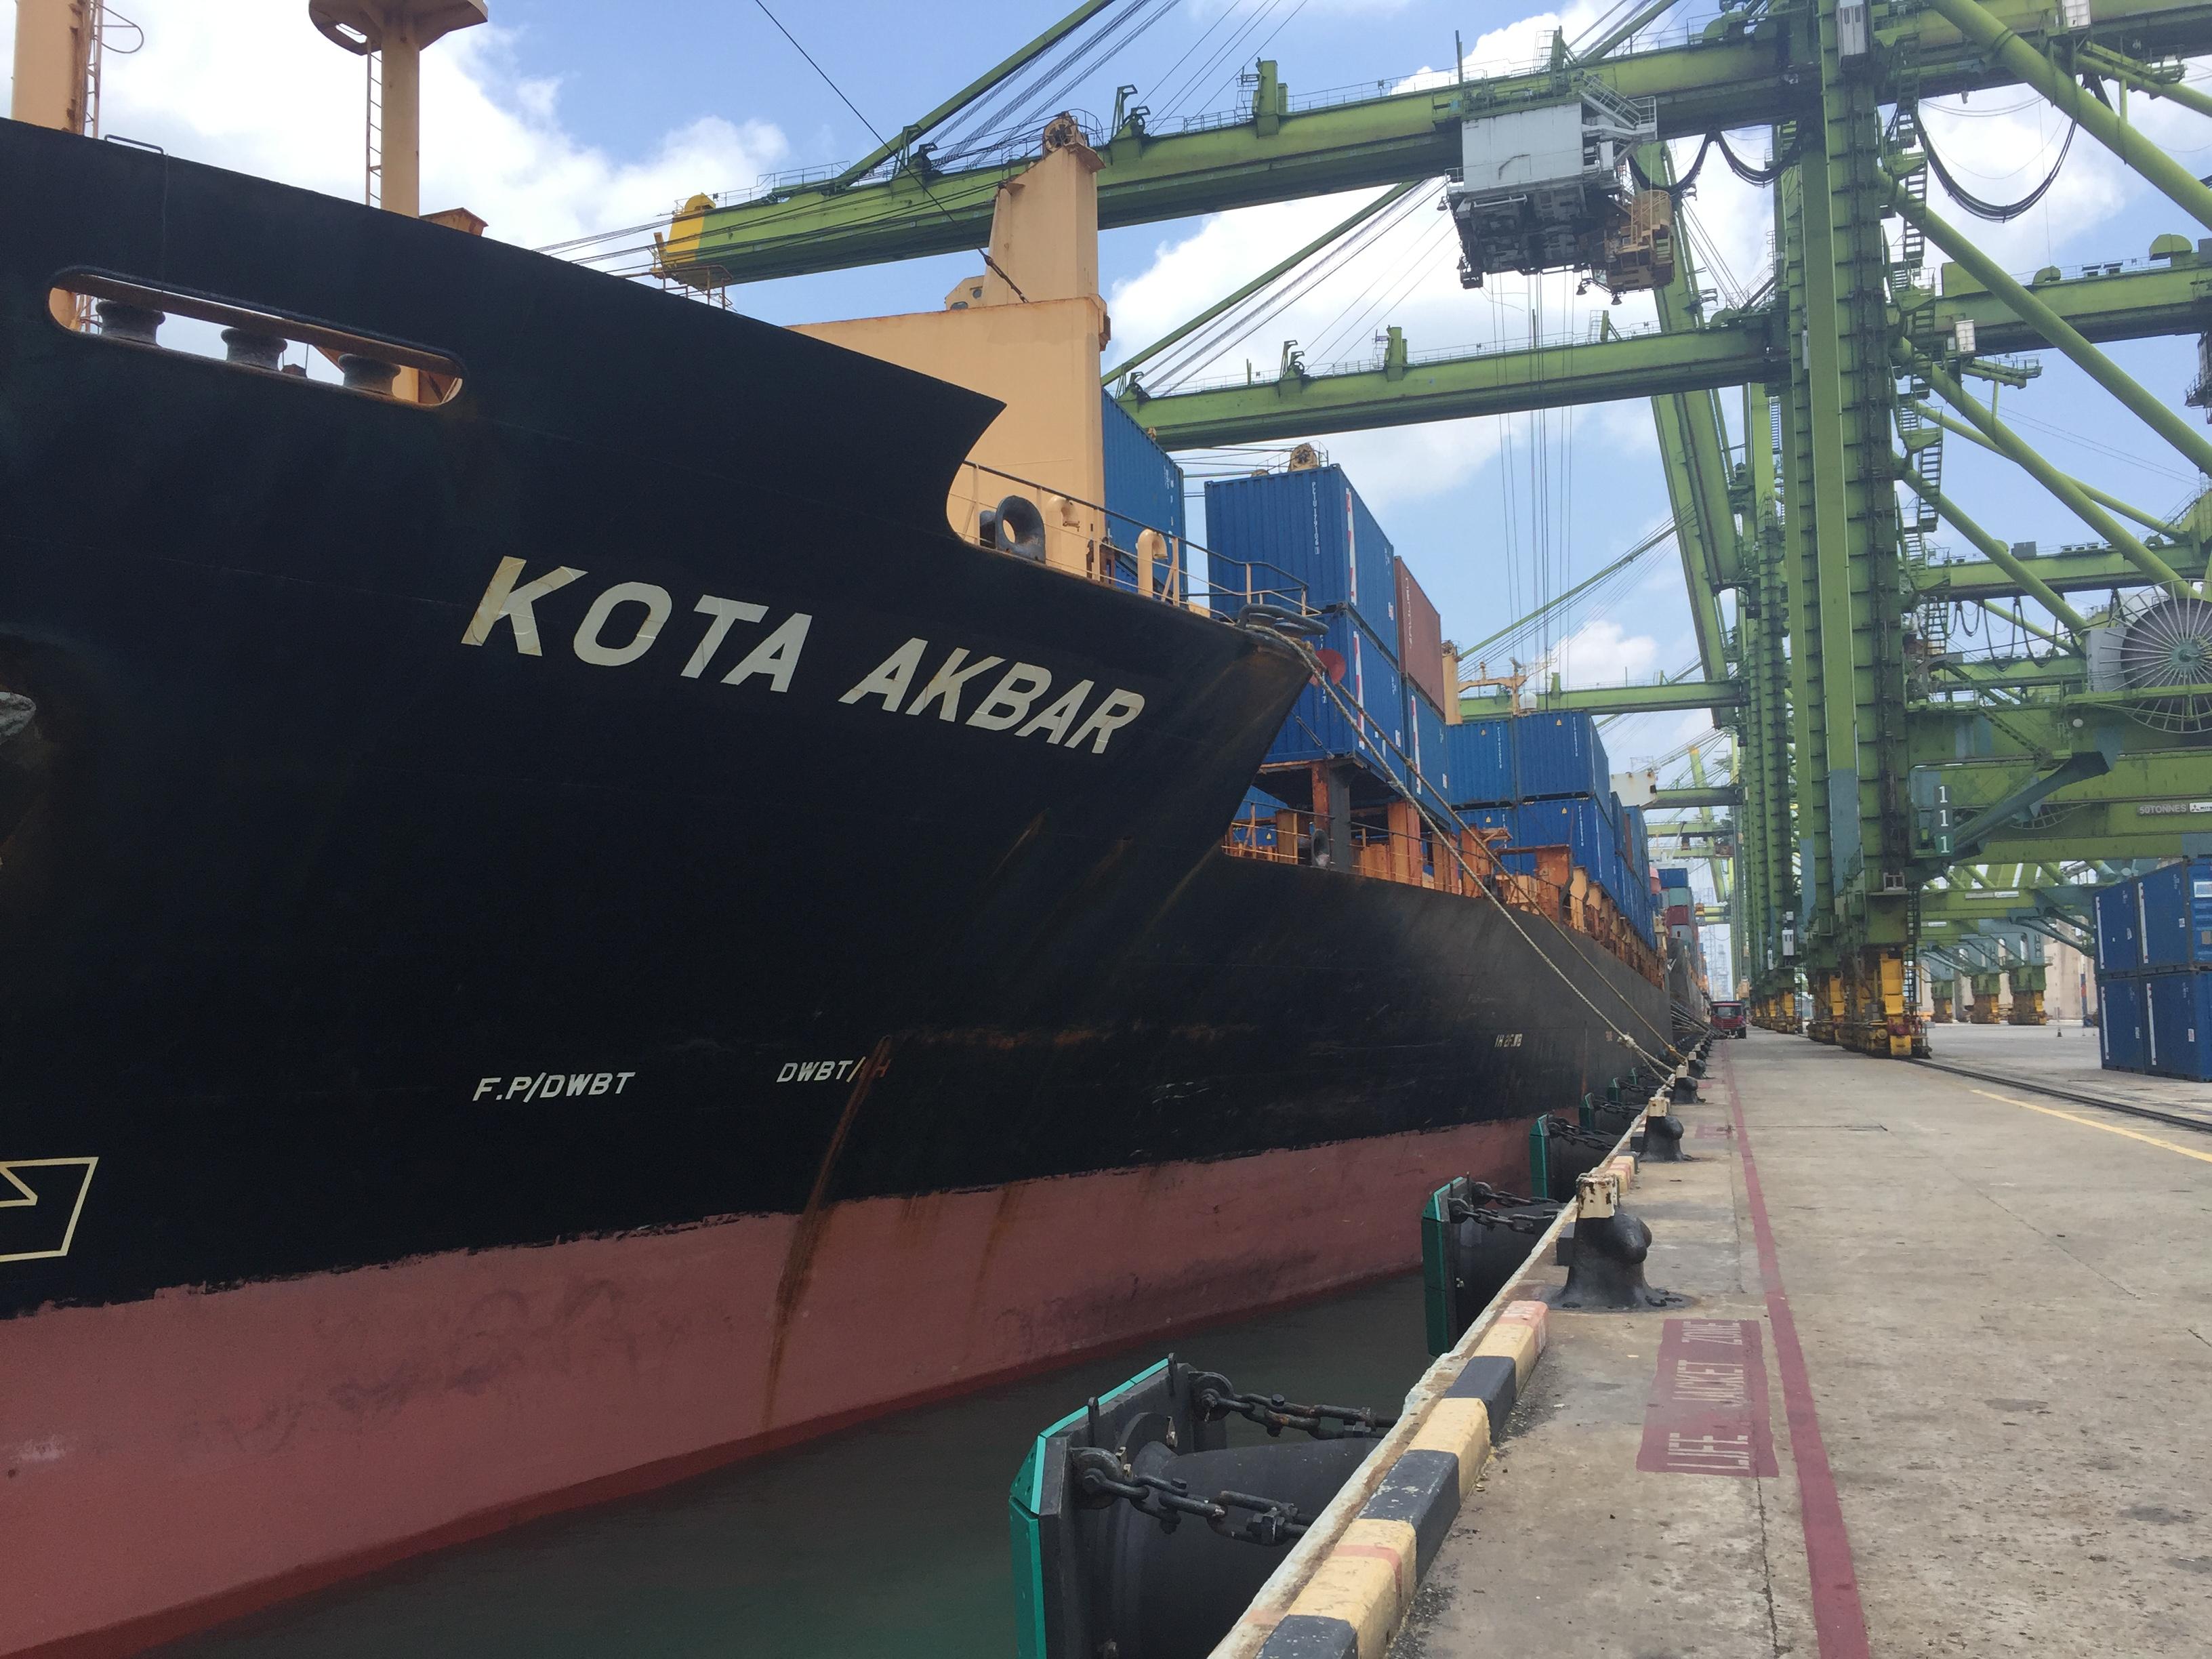 "MV ""Kota Akbar"" at berth (Port of Singapore)"